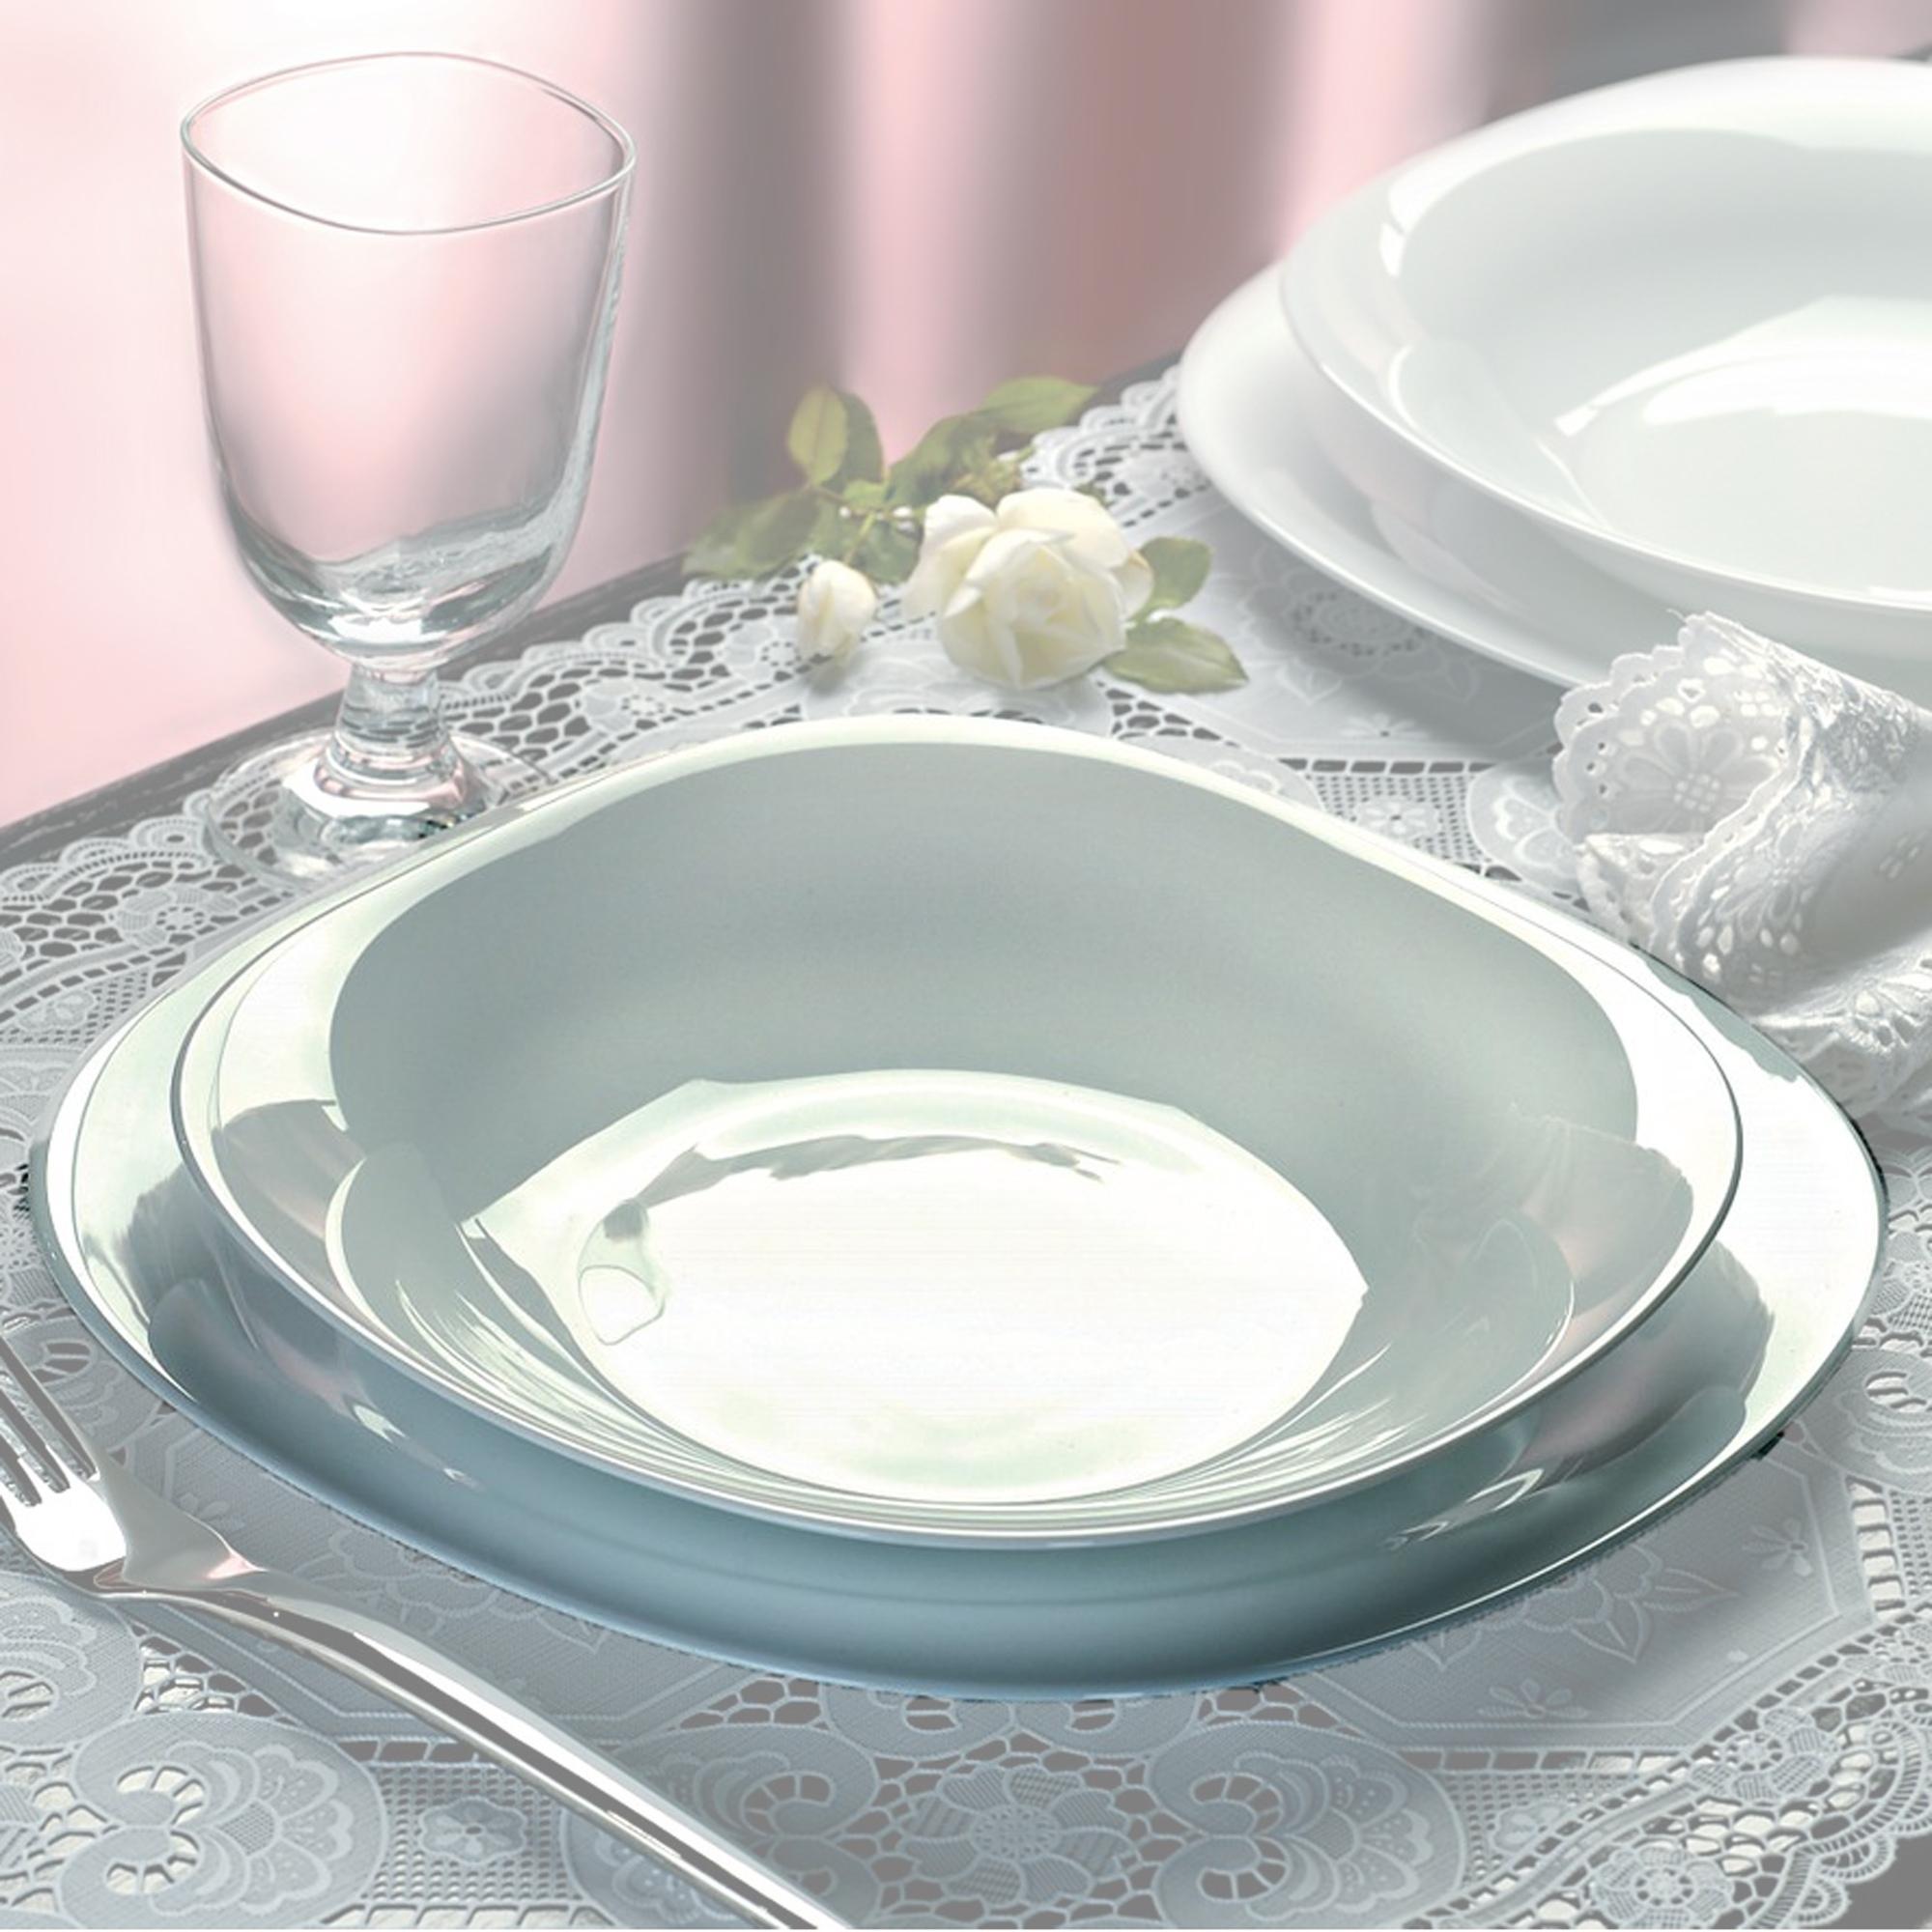 8411712559403  sc 1 st  eBay & Bormioli Rocco Parma 19 Pcs Dinner Service Set Opal Glass Tableware ...